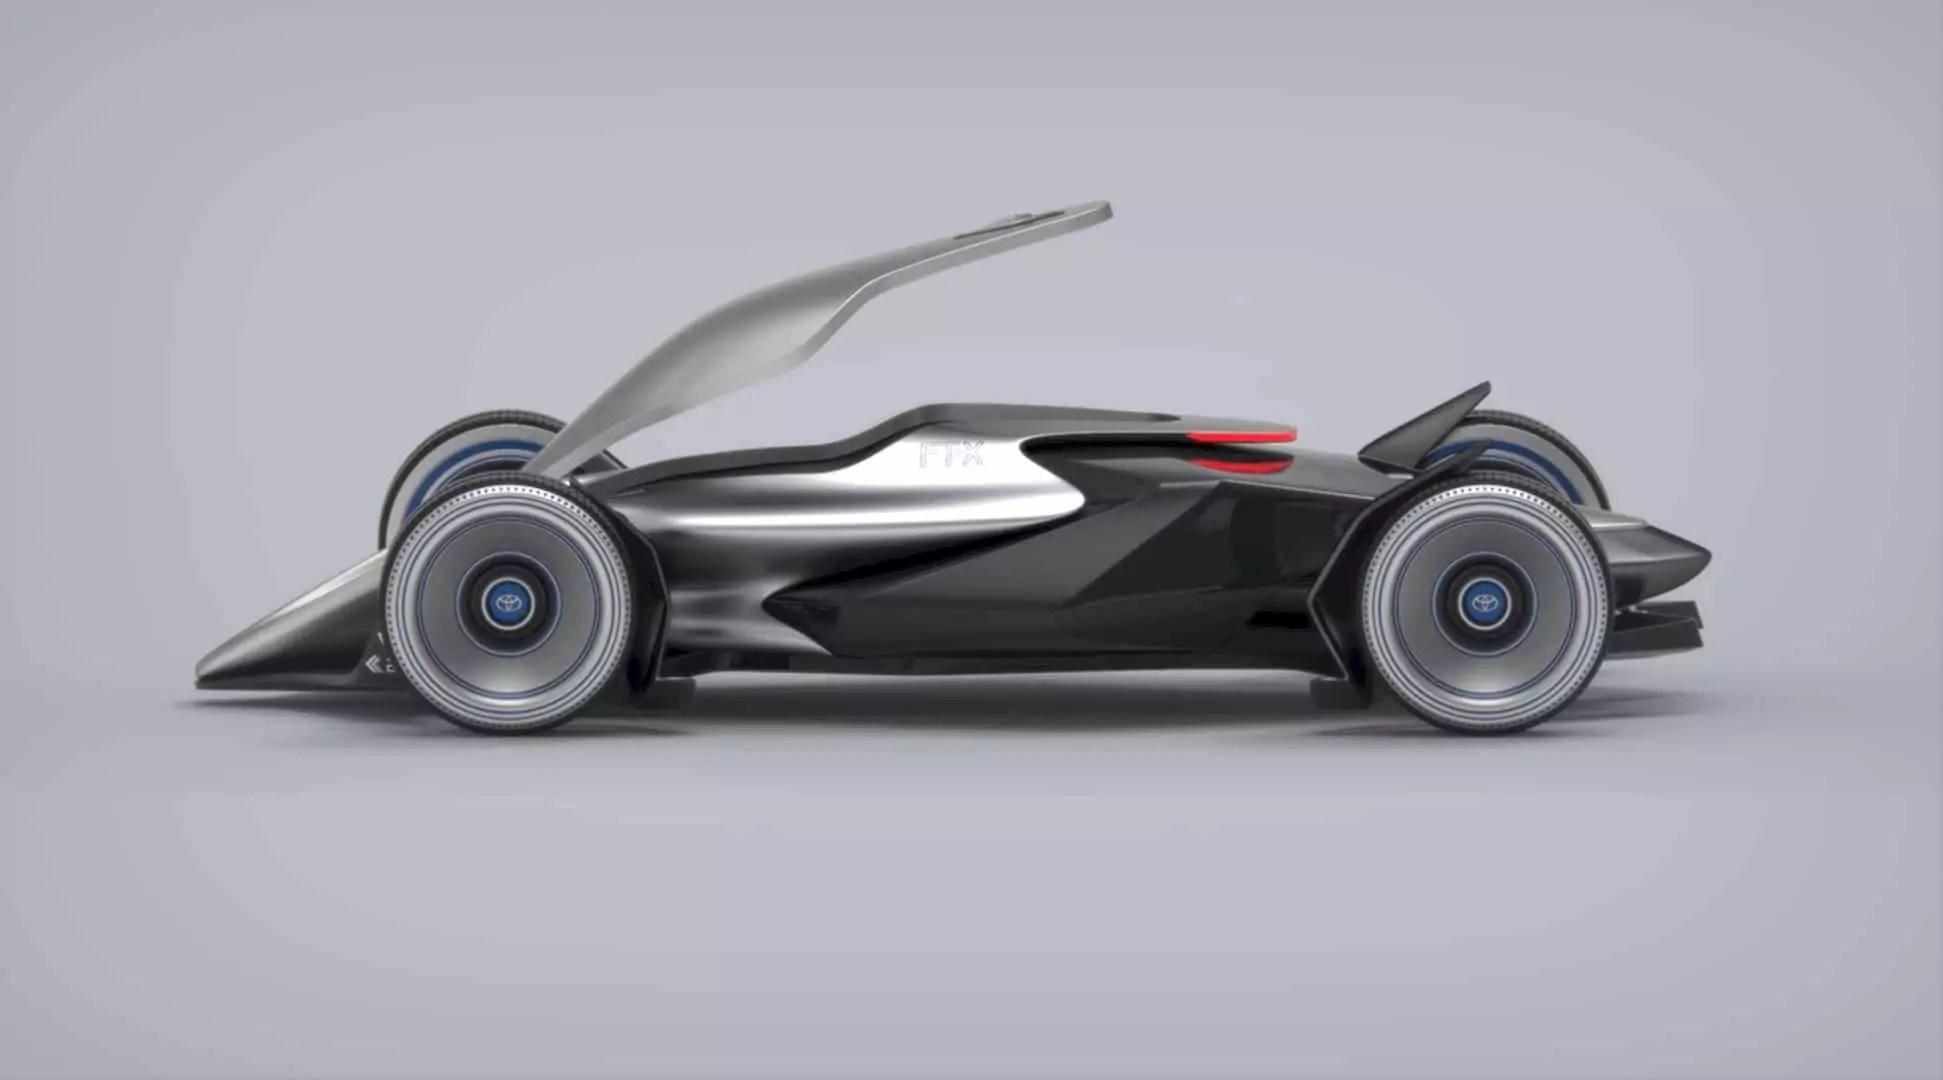 Toyota Car - FT-X Race Car: A Conceptual Design Project of A Futuristic Race Car